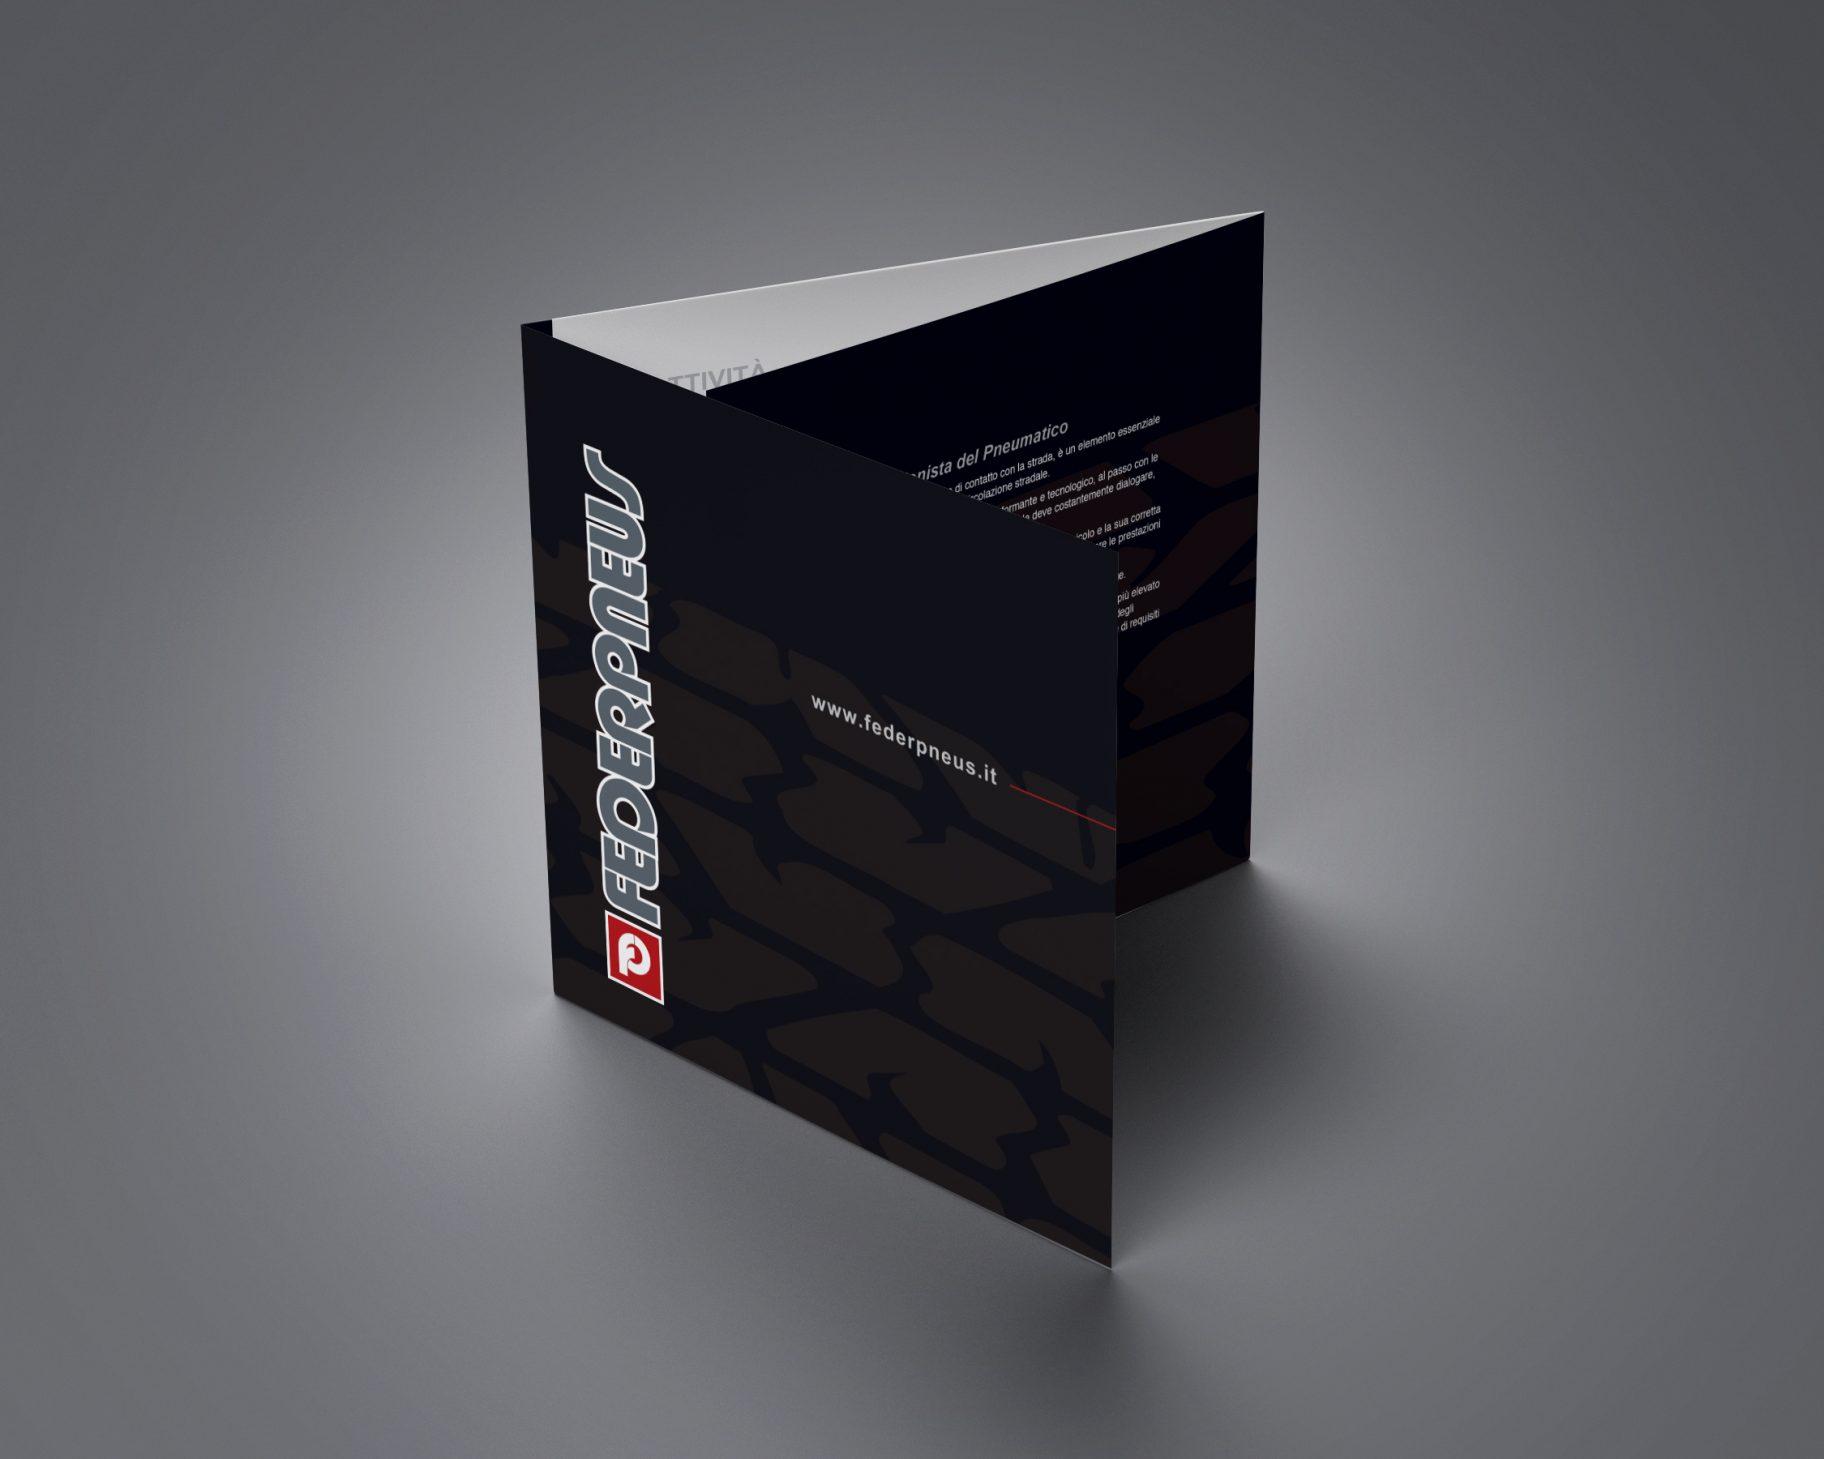 Federpneus-Brochure-Pieghevole-copertina 02